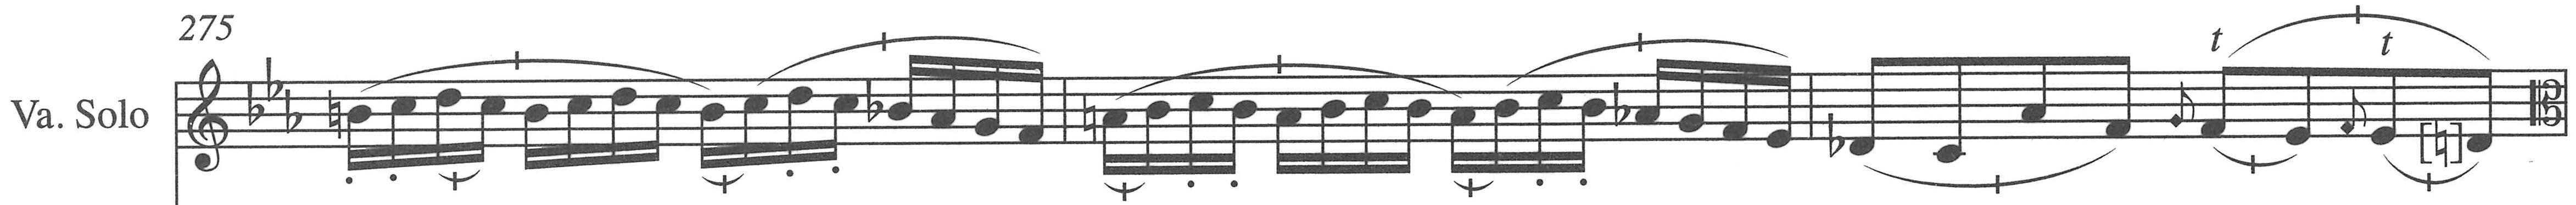 Figure 6. Viola solo part, first movement, measures 275–77.